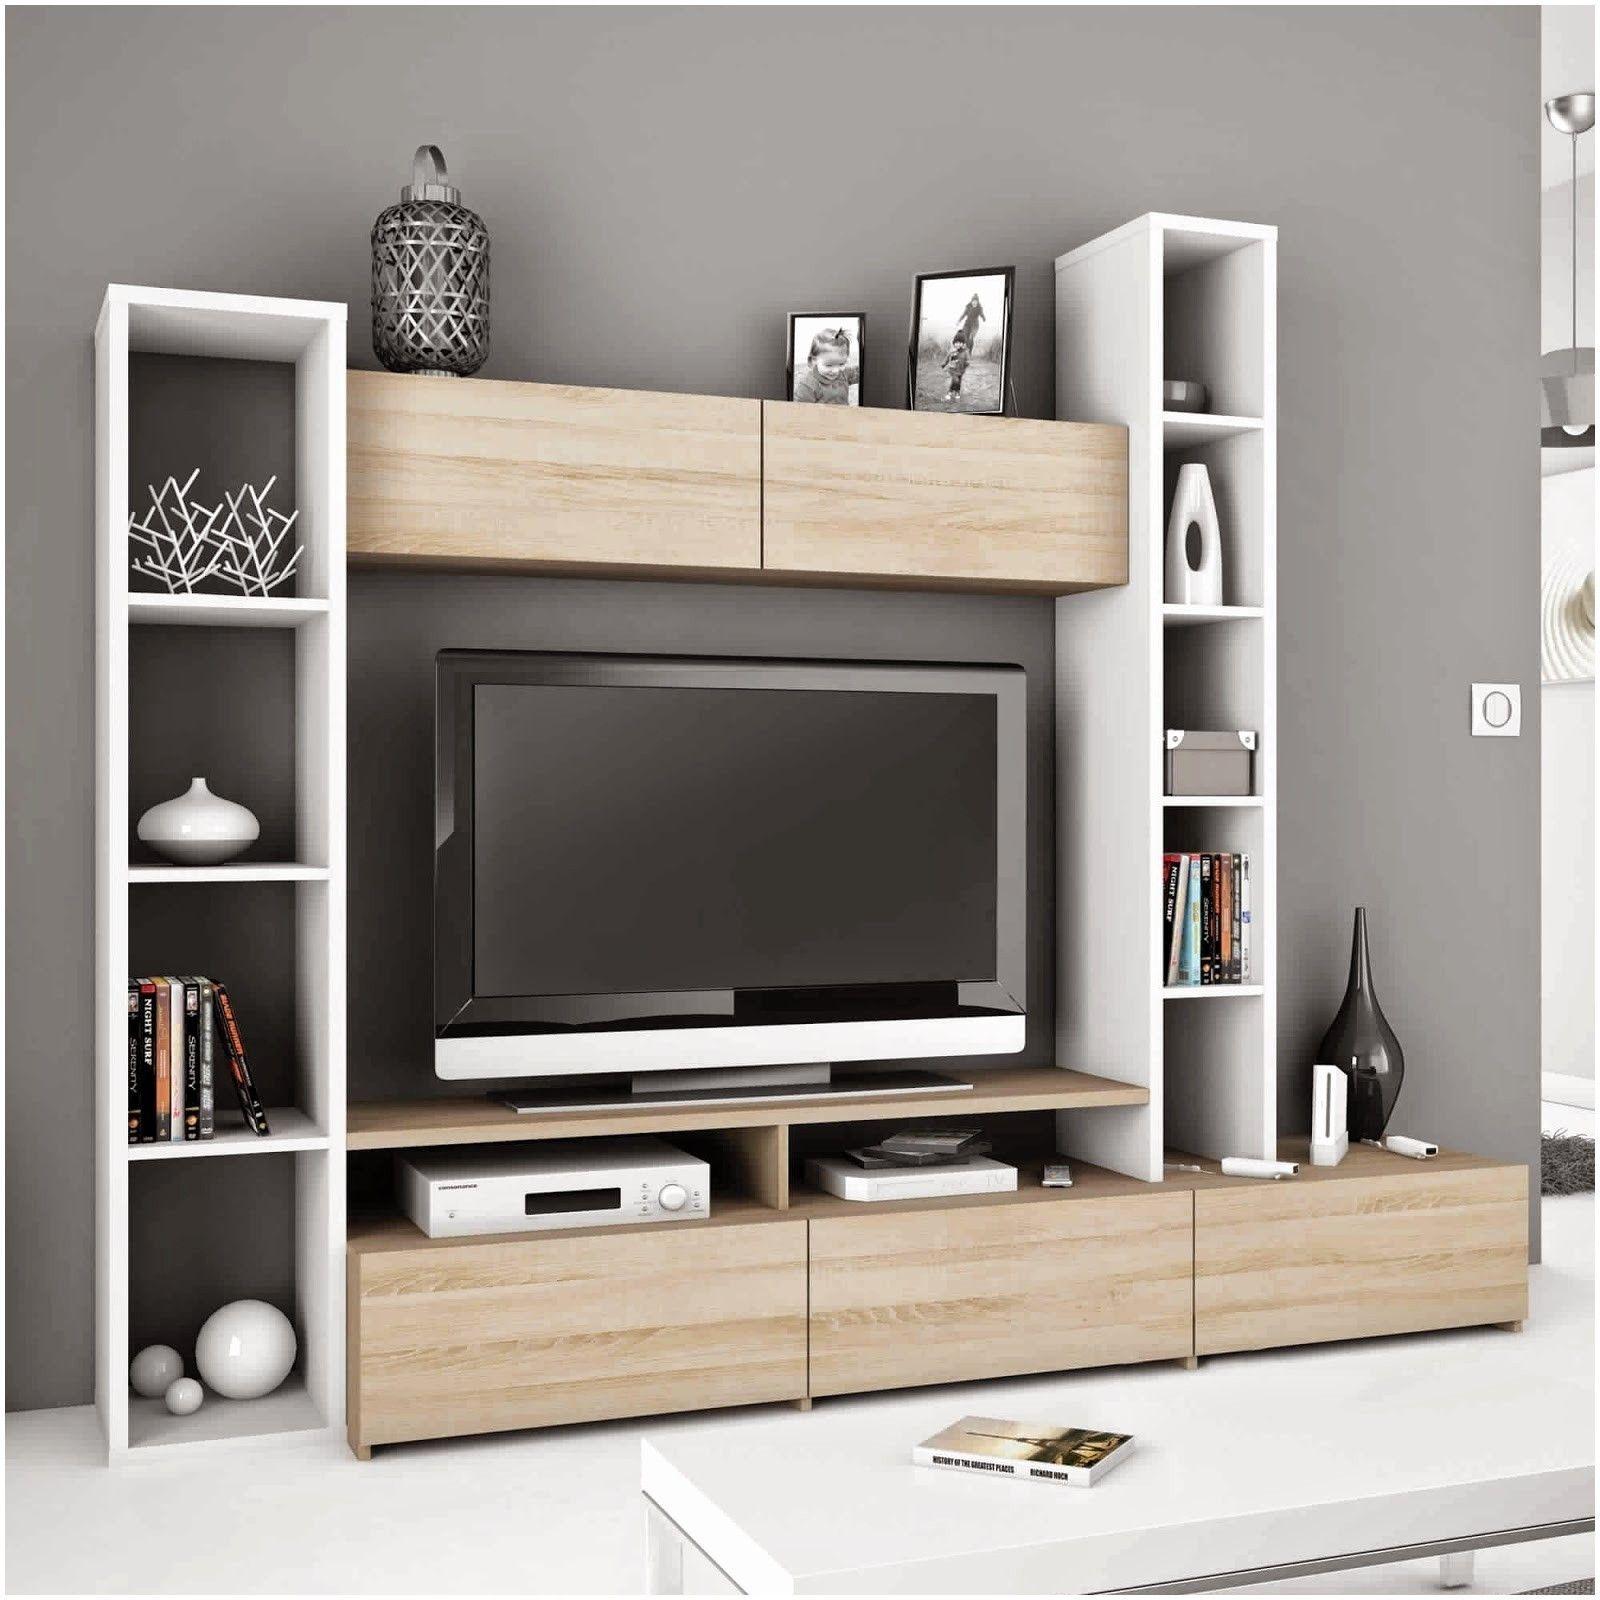 28 Luxe Meuble Tv Roulettes Plateau Tournant Suggestions Rumah Dekorasi Rumah Mebel